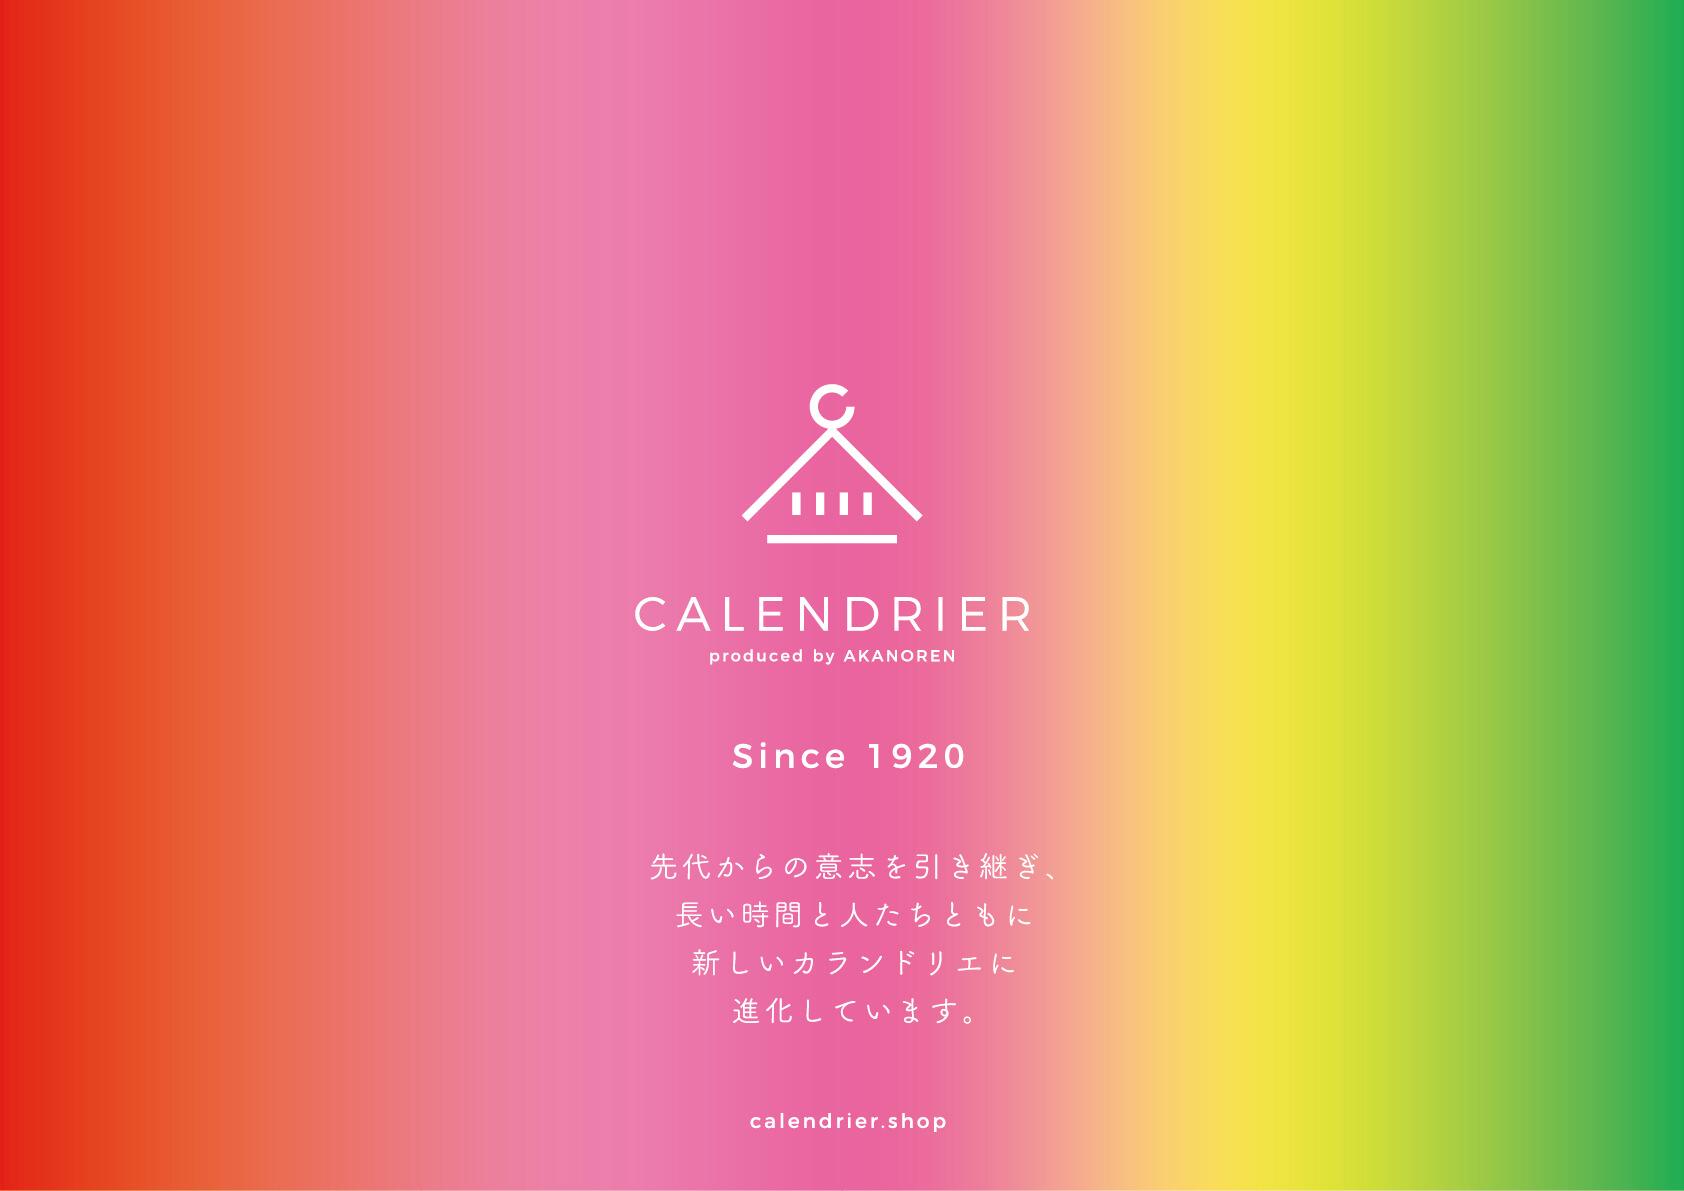 CALANDRIER(カランドリエ)ビジュアル イラスト